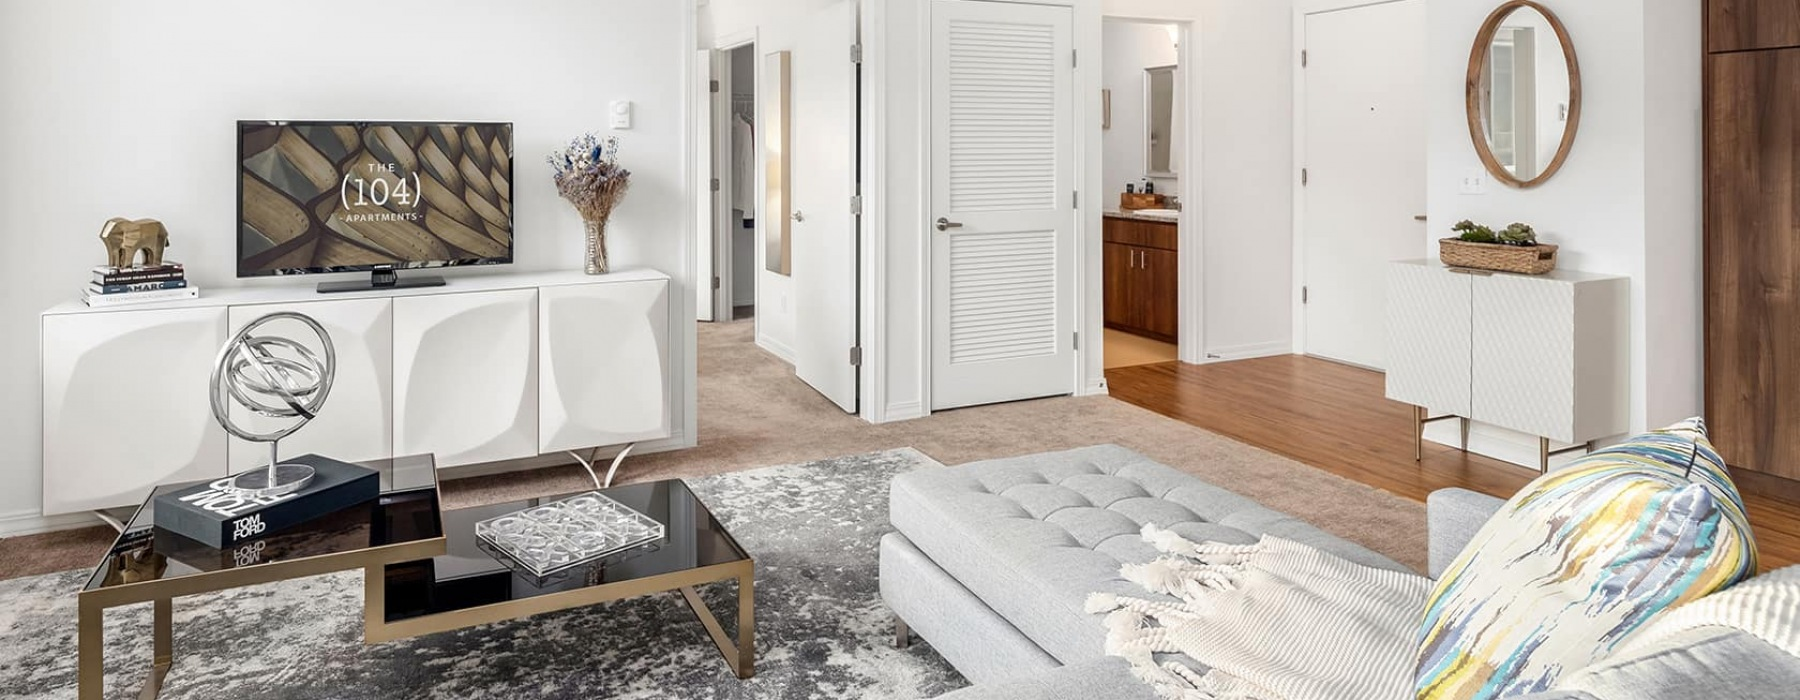 Spacious floor plans with an abundance of natural light.